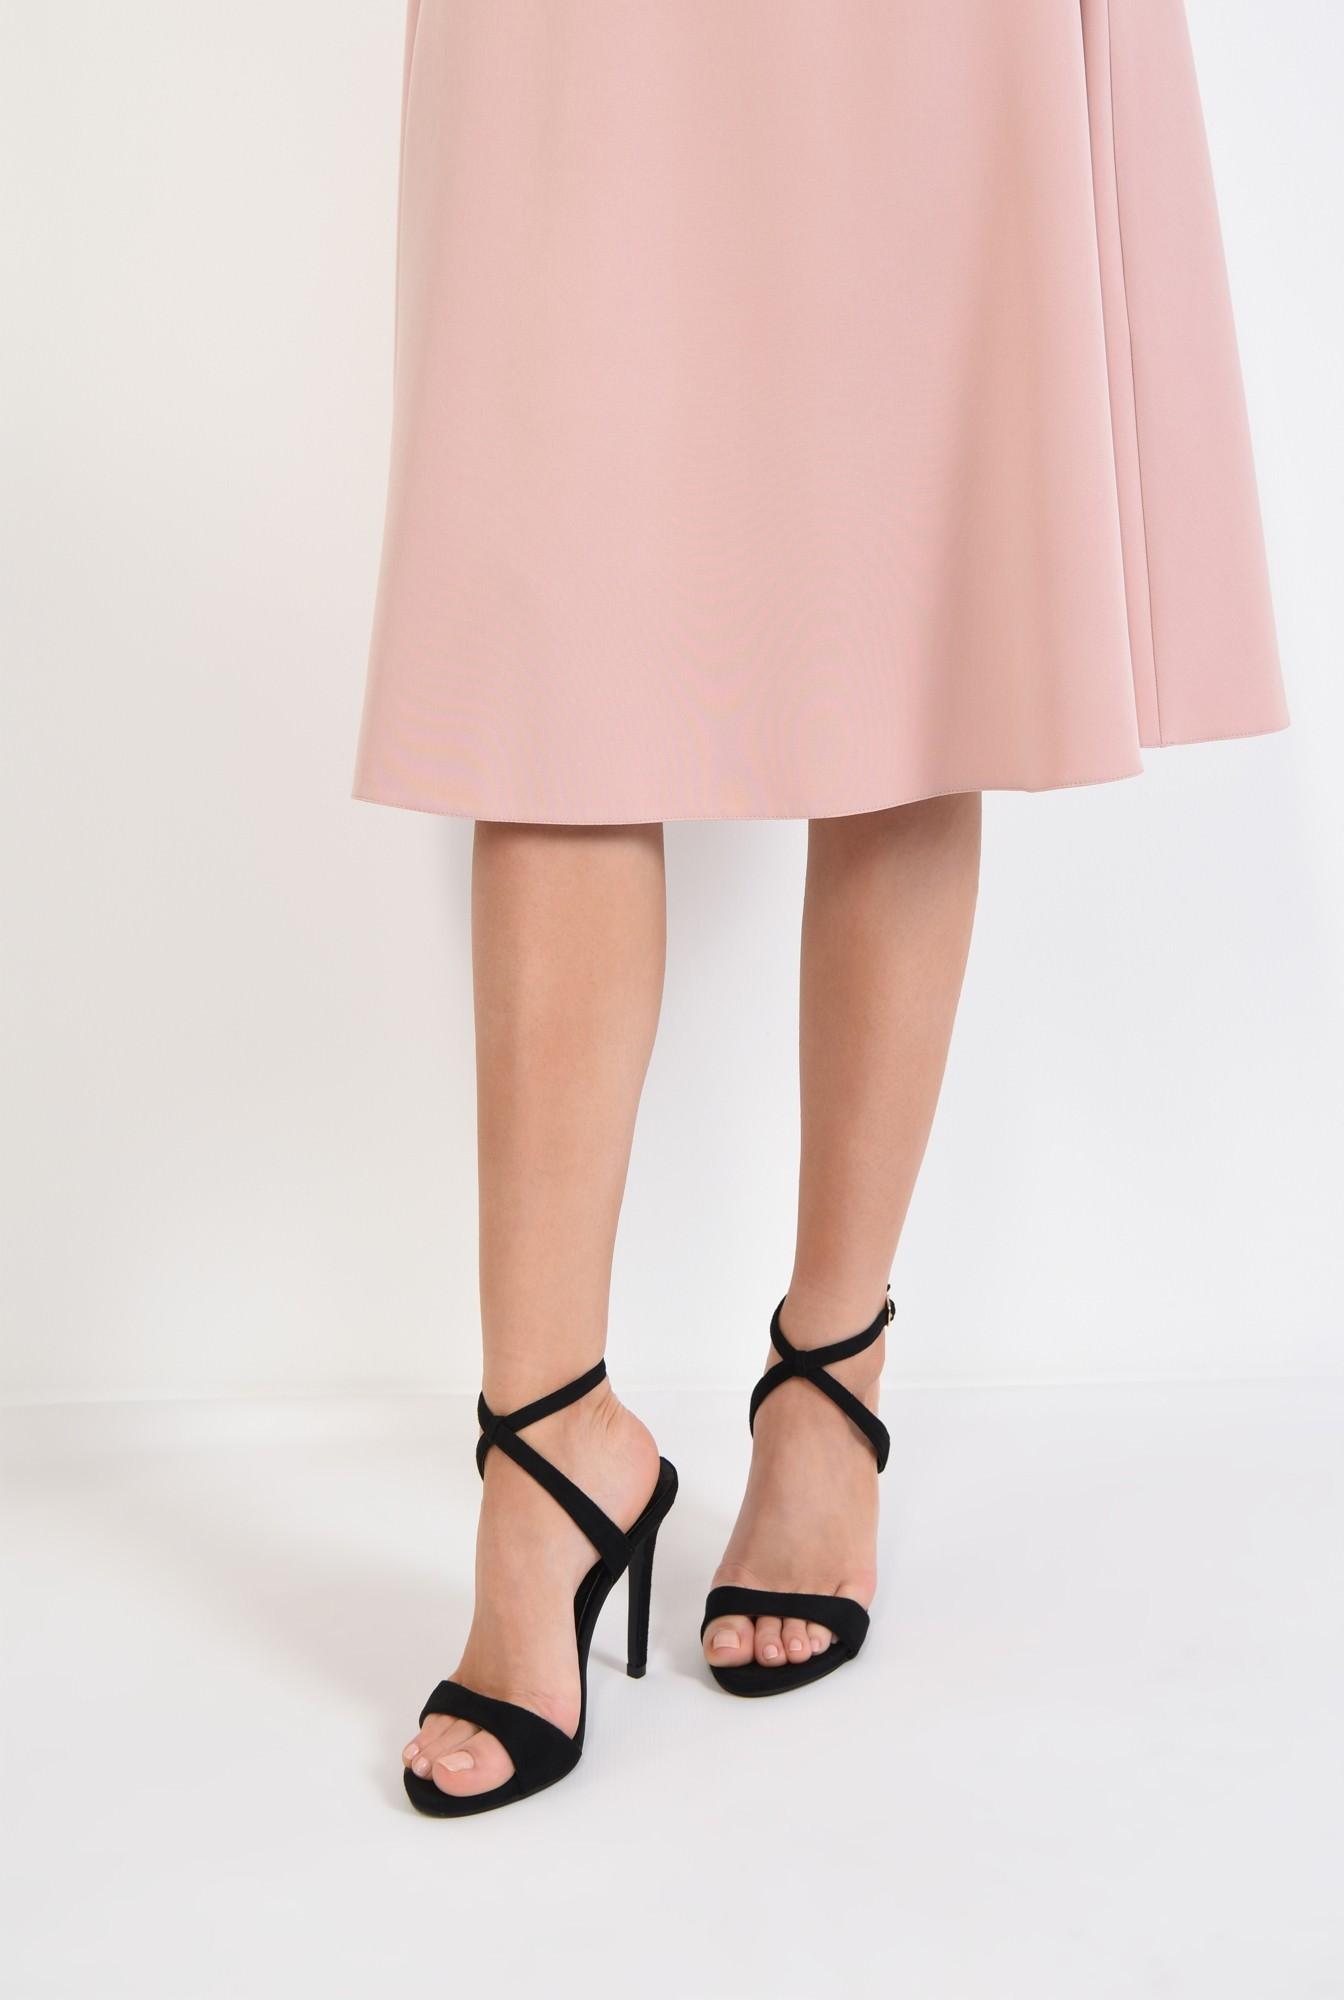 4 - sandale elegante, velur, negru, toc cui